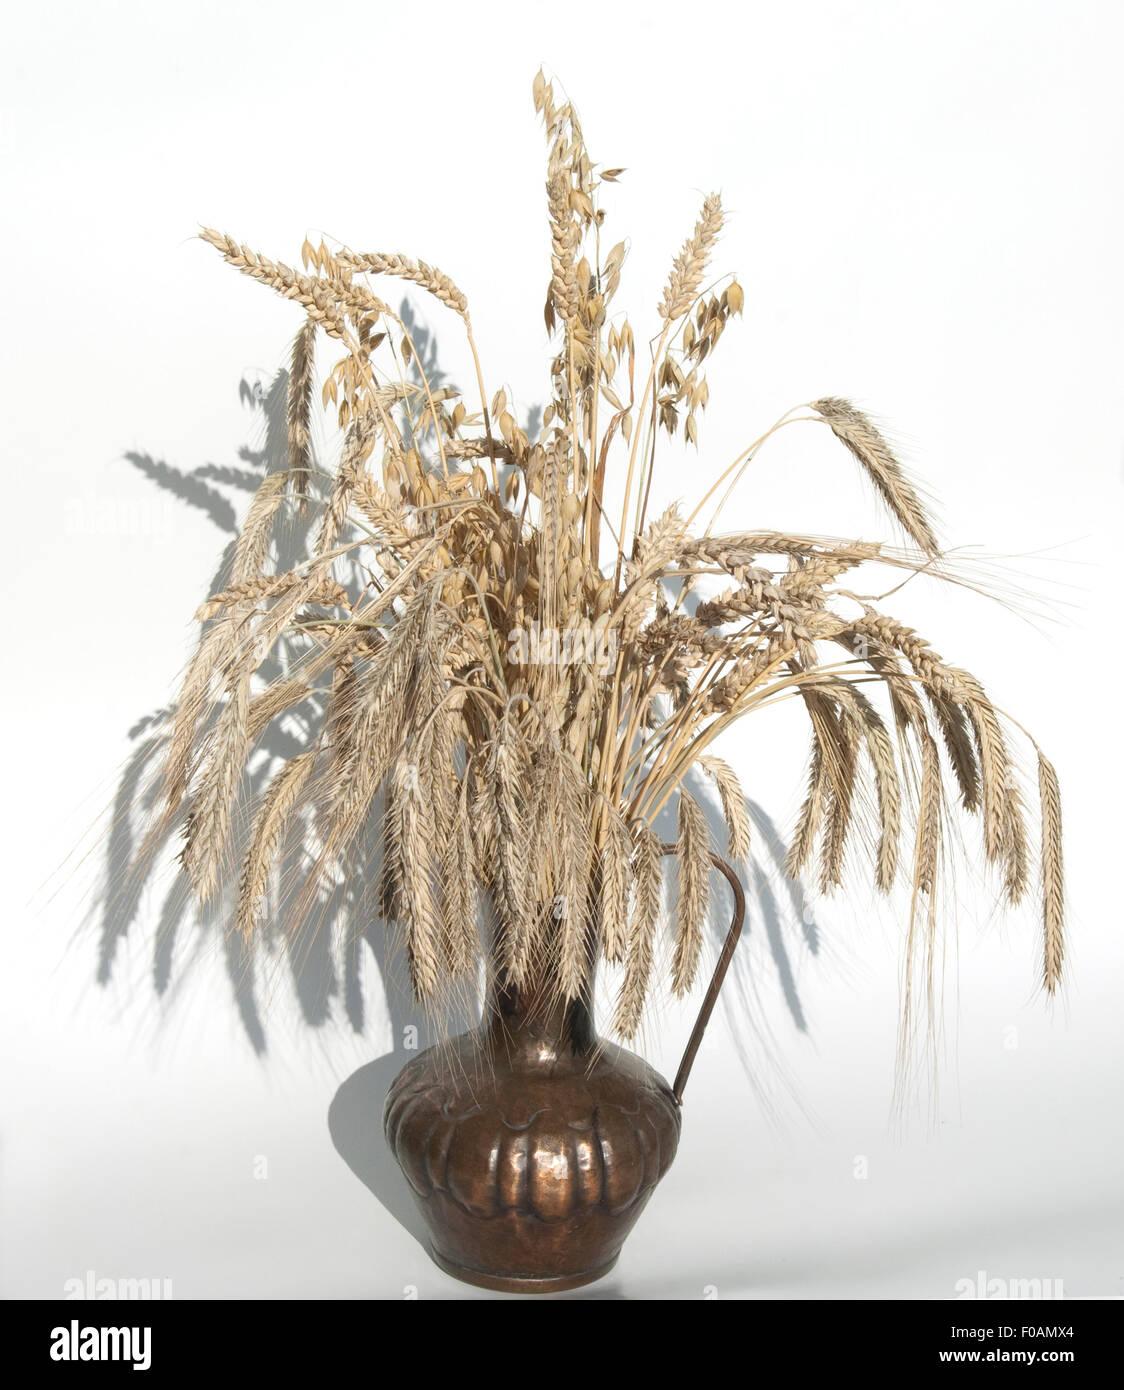 Getreidestrauss - Stock Image